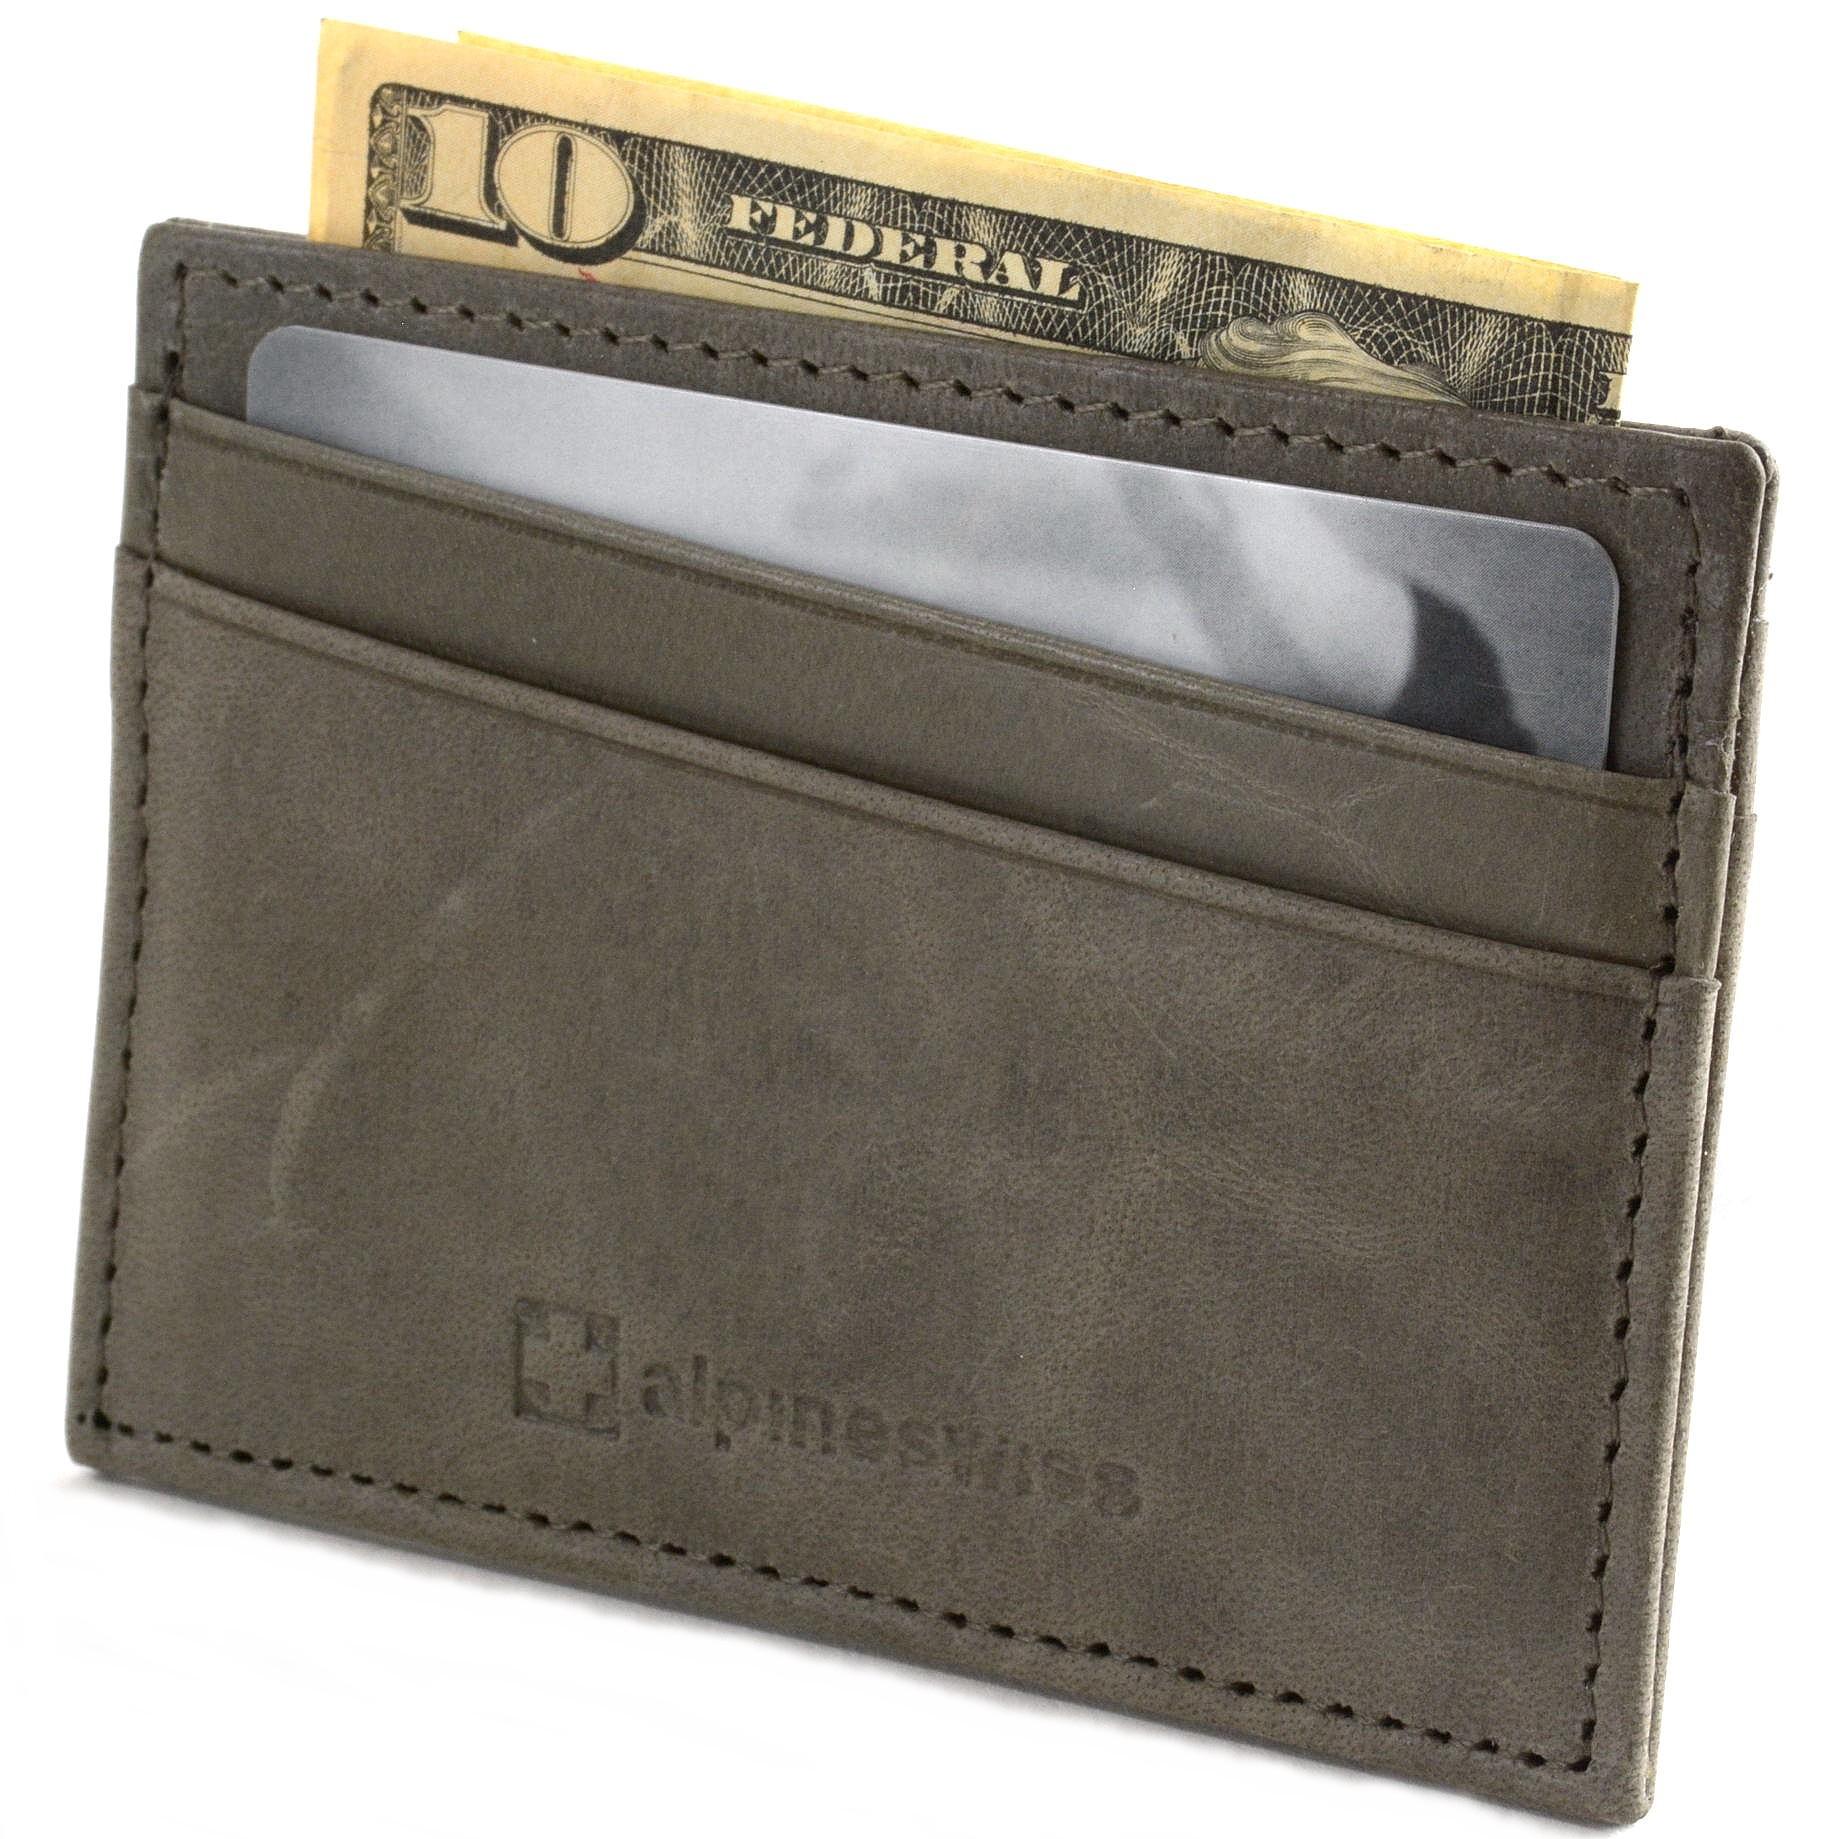 Alpine-Swiss-Minimalist-Leather-Front-Pocket-Wallet-5-Card-Slots-Slim-Thin-Case thumbnail 59